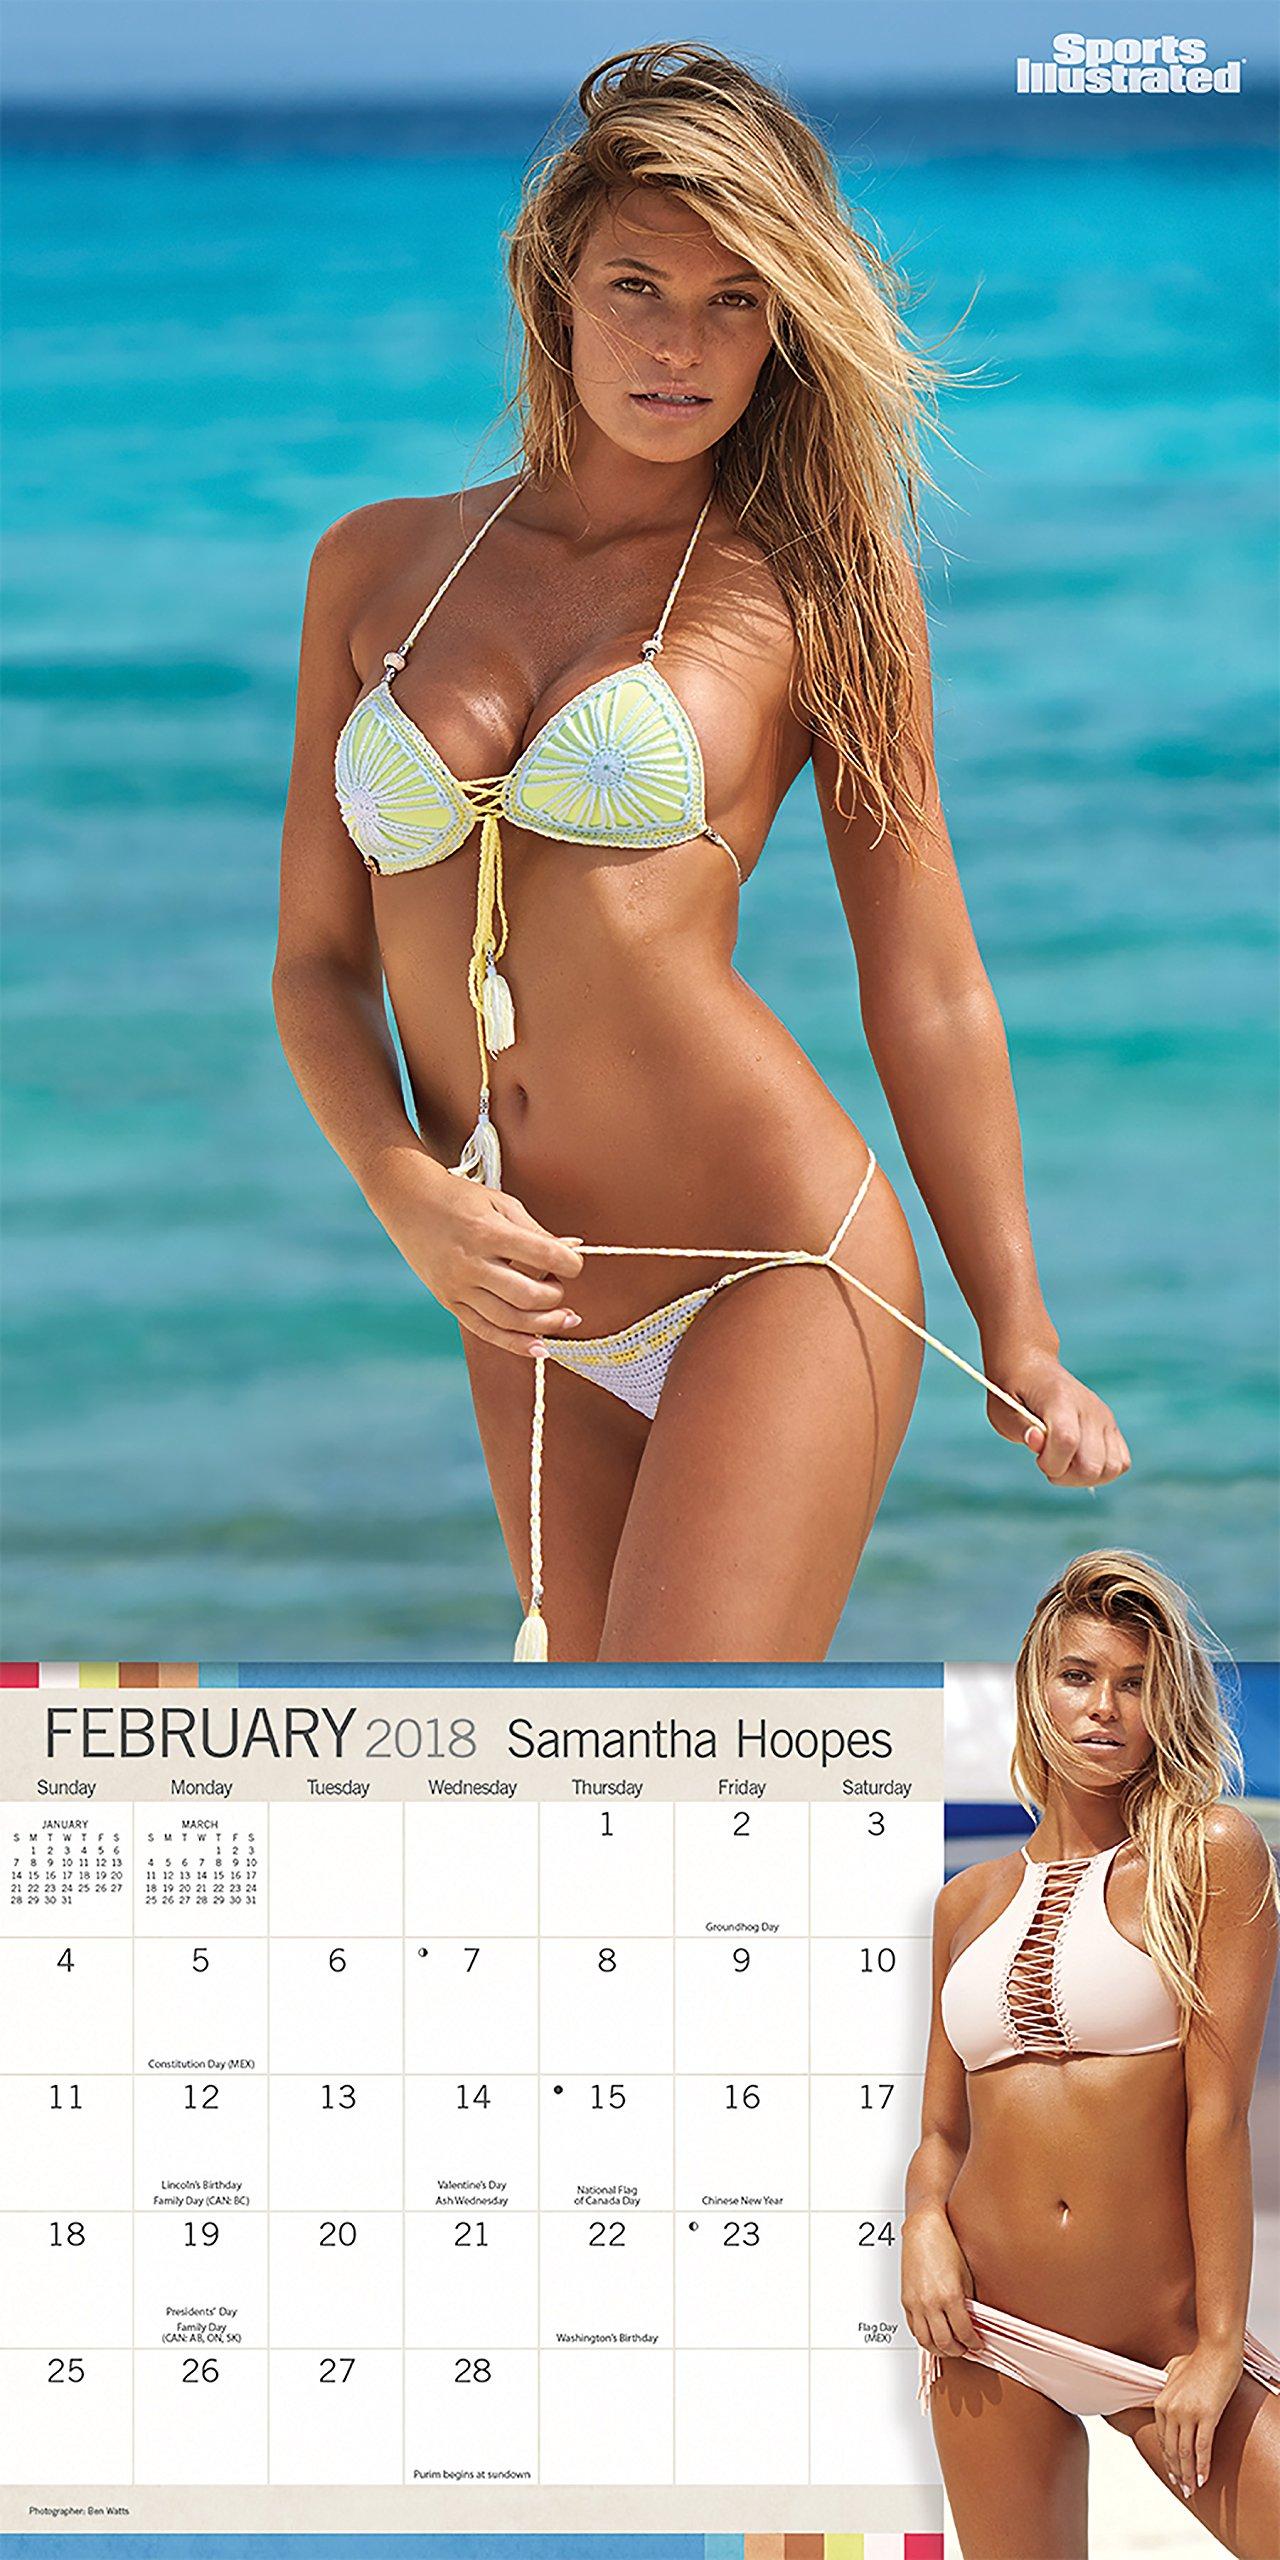 f50afd547bc Sports Illustrated Swimsuit 2018 Mini Wall Calendar: Trends International:  9781438851679: Amazon.com: Books